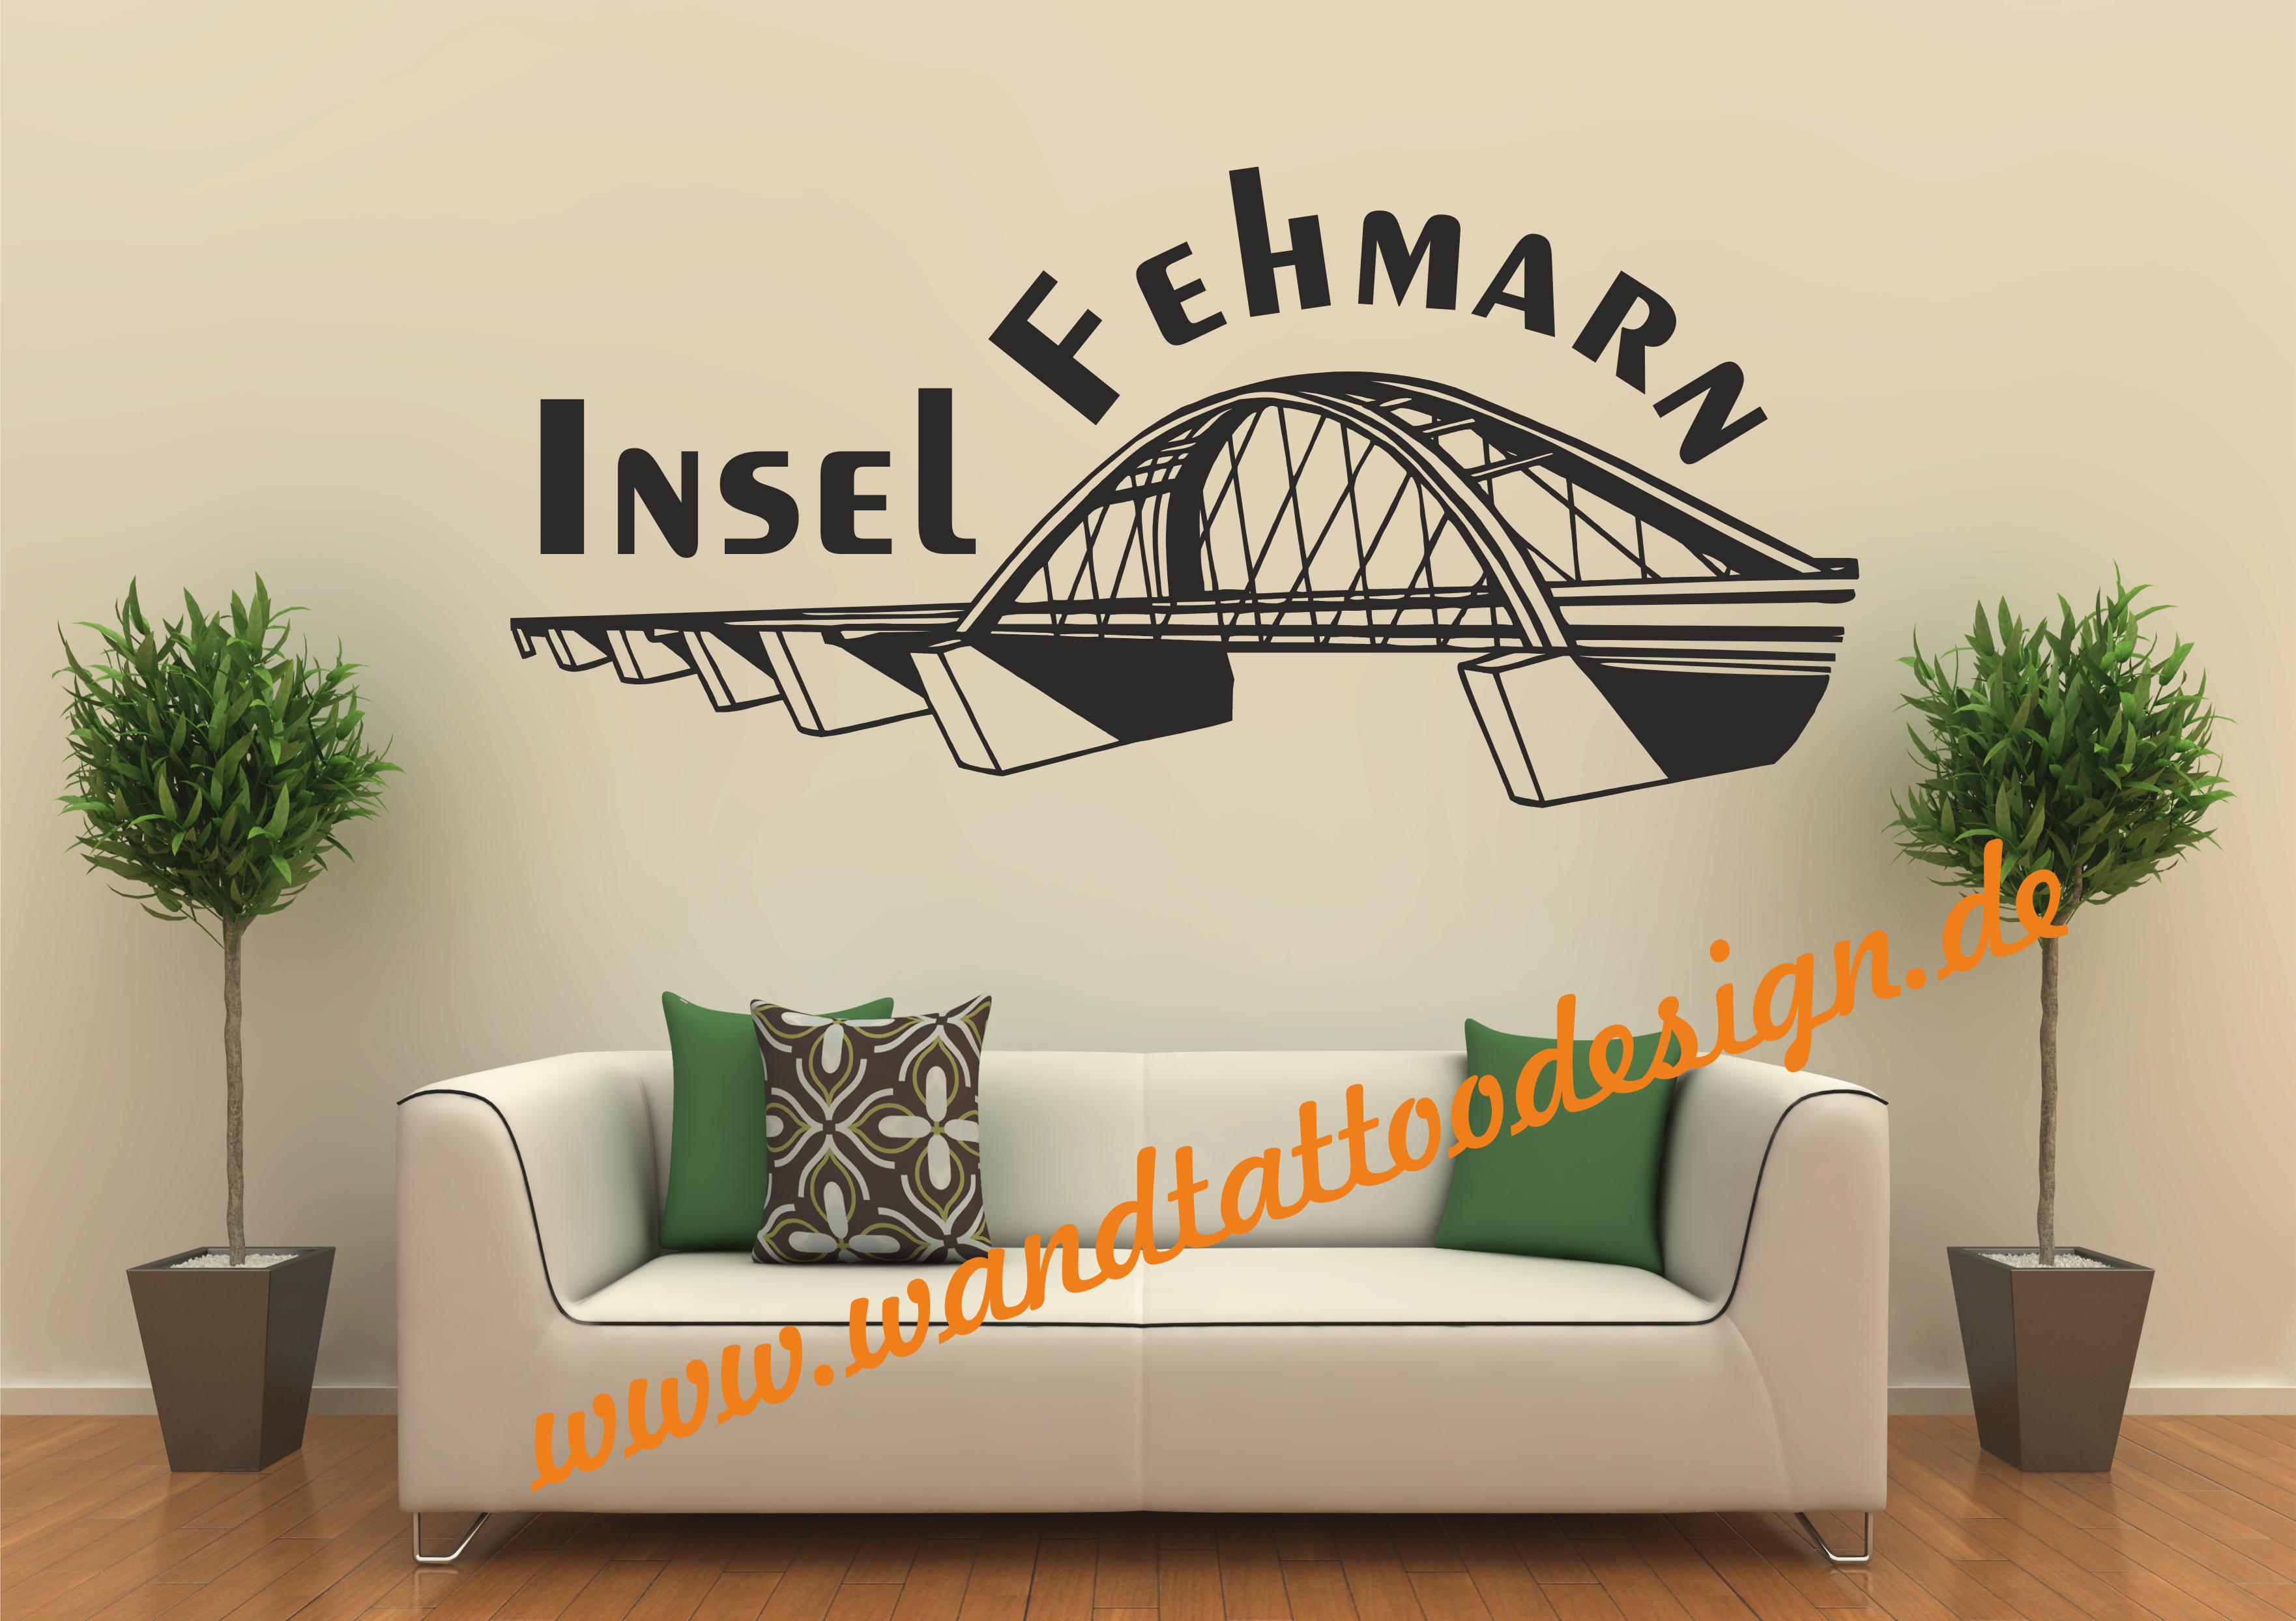 wandtattoo fehmarn. Black Bedroom Furniture Sets. Home Design Ideas